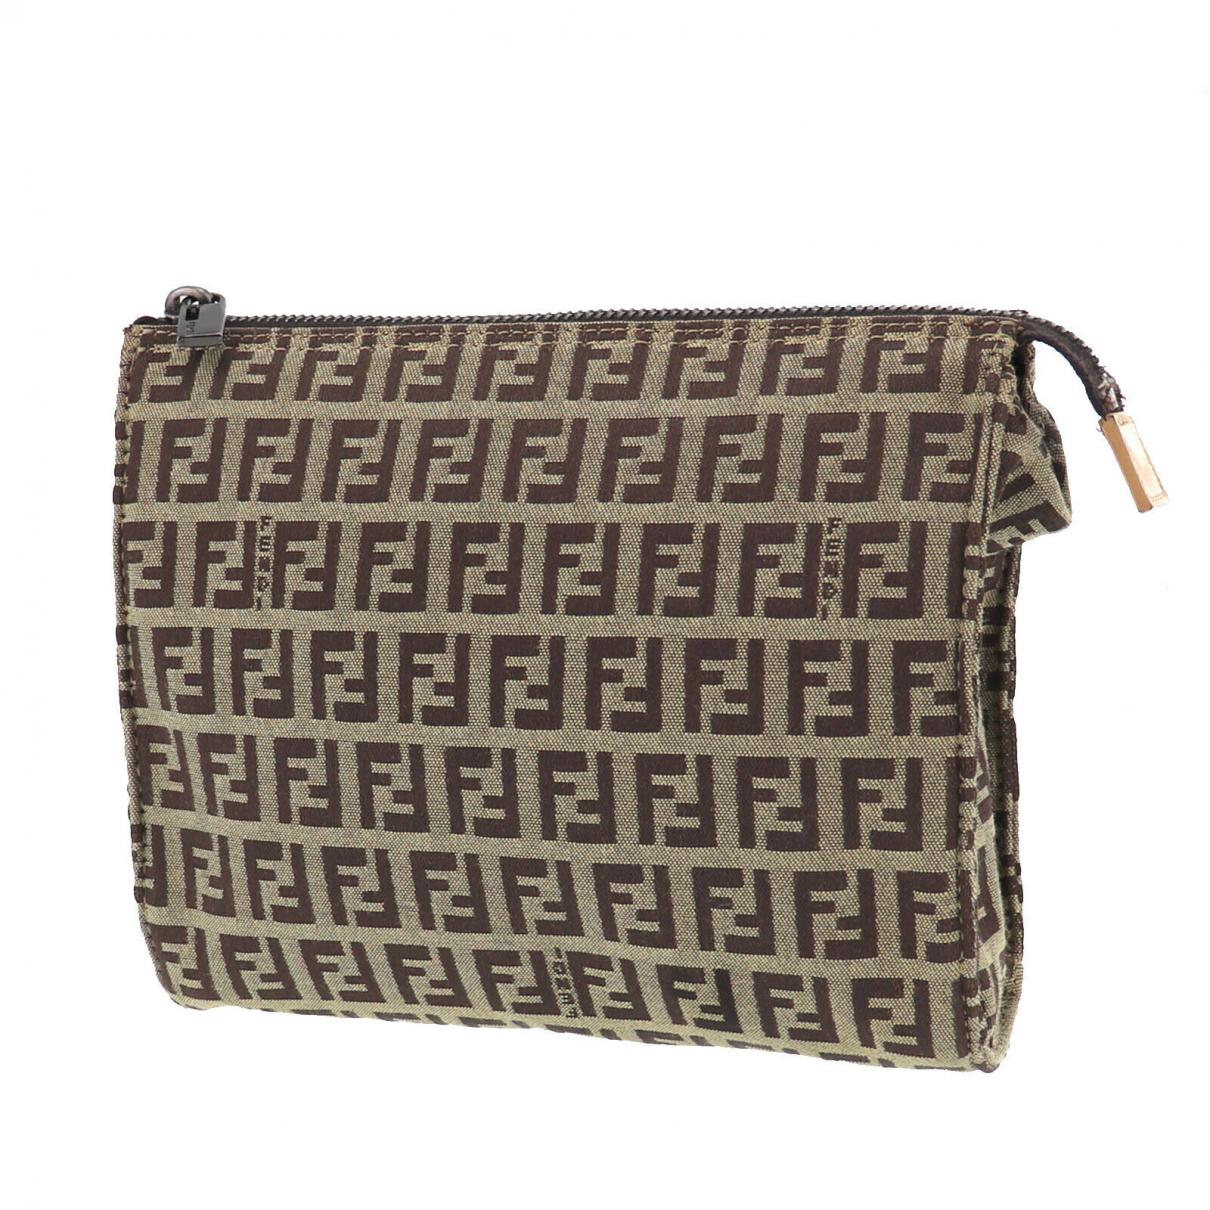 Fendi N Brown Leather Purses, wallet & cases for Women N